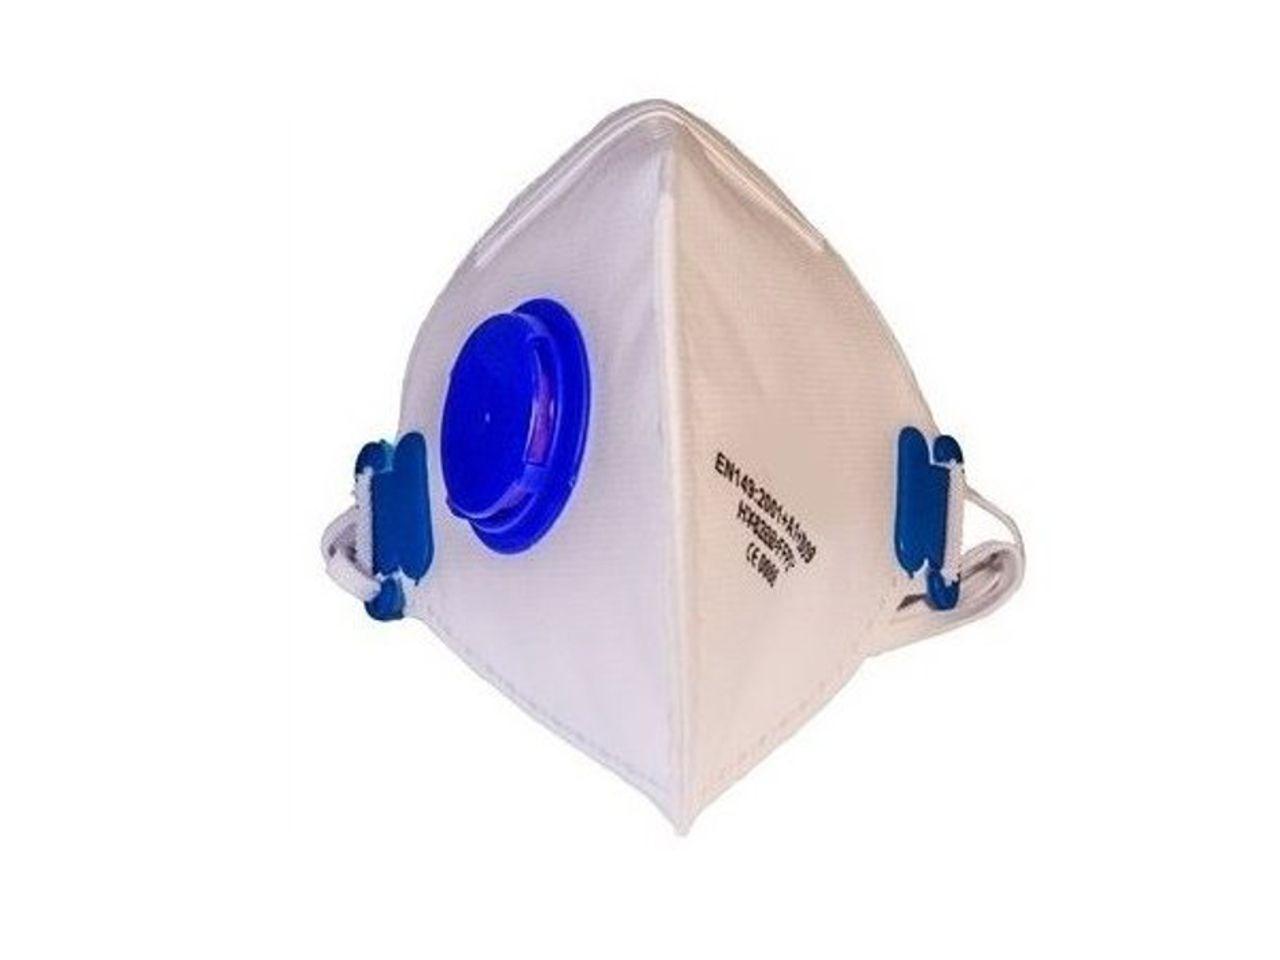 Respirátor BAMAX HY8226 s ventilem, FFP2 | CHAT on-line podpora PO-PÁ 8-22.00!!